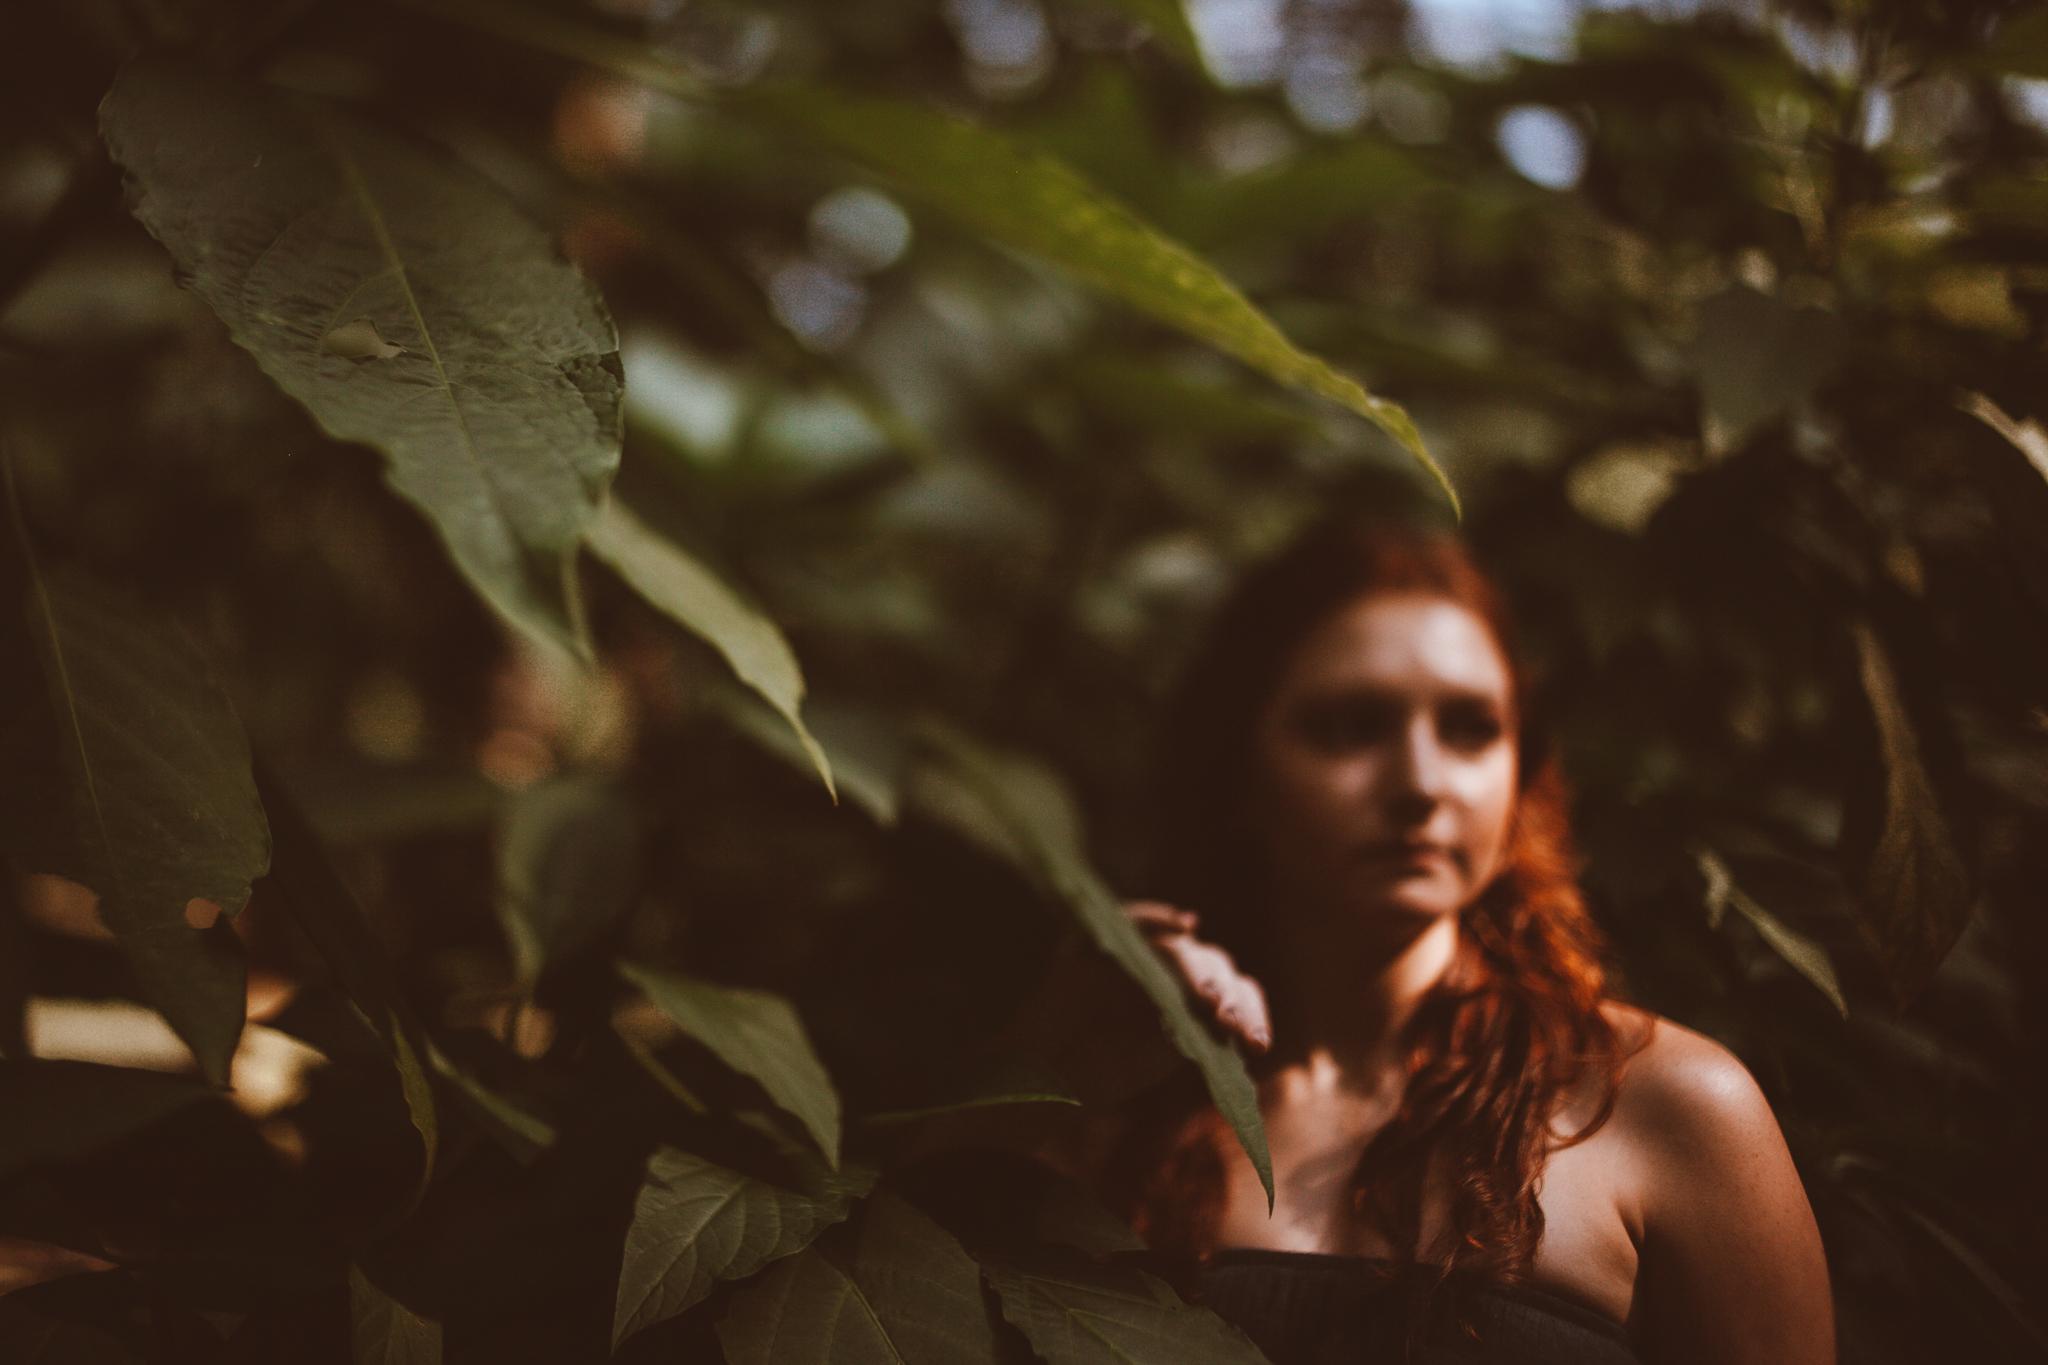 gainesville-photography-senior-session-bryanna-9198